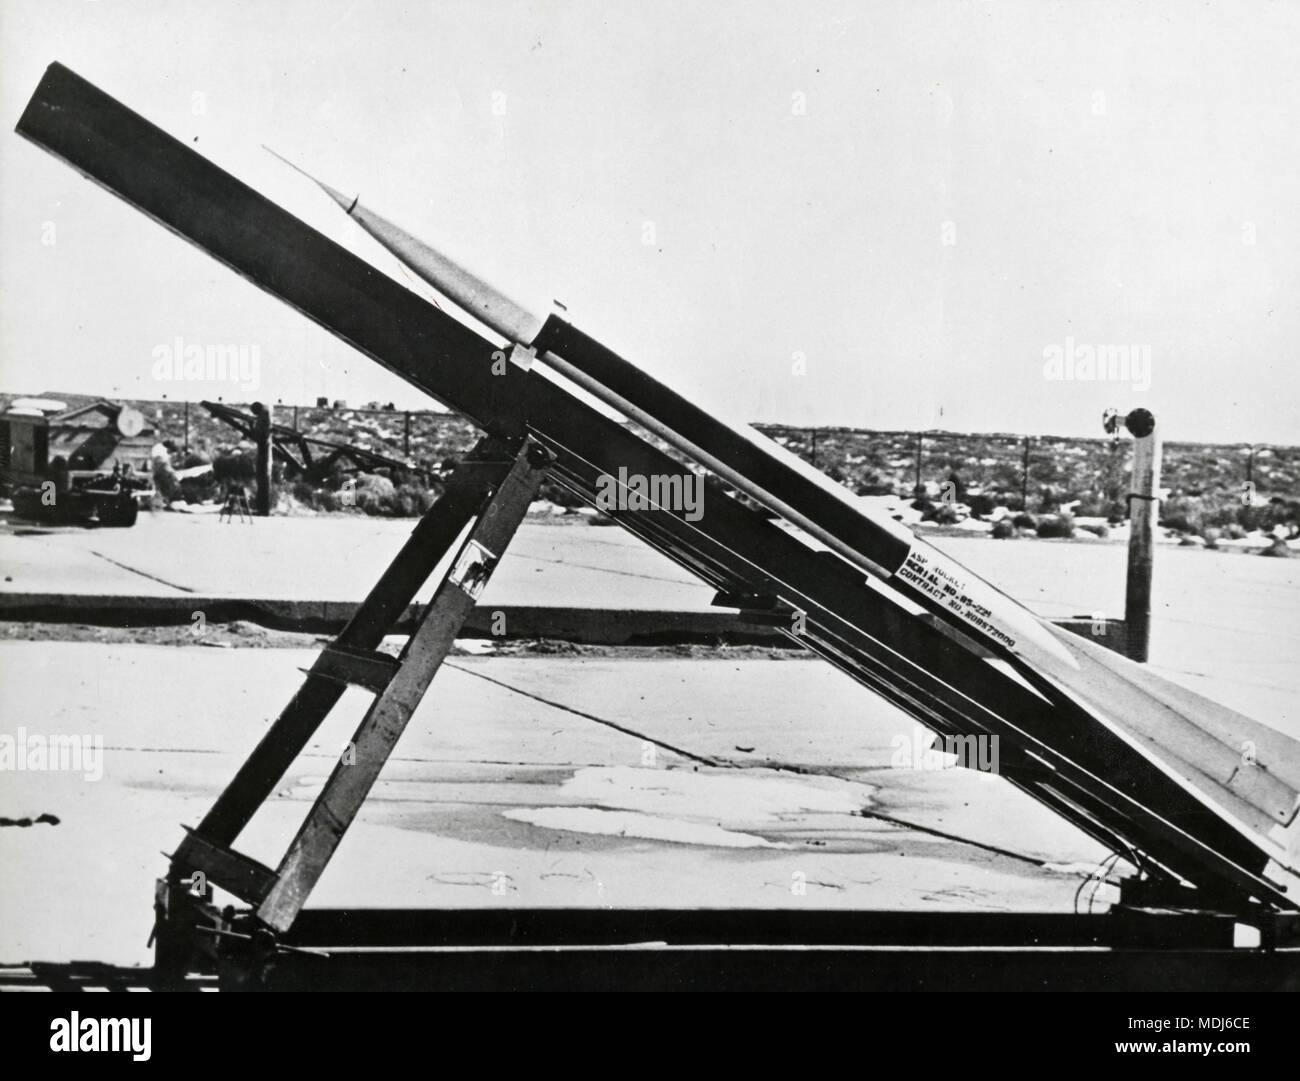 Nike ASP rocket, USA 1958 - Stock Image